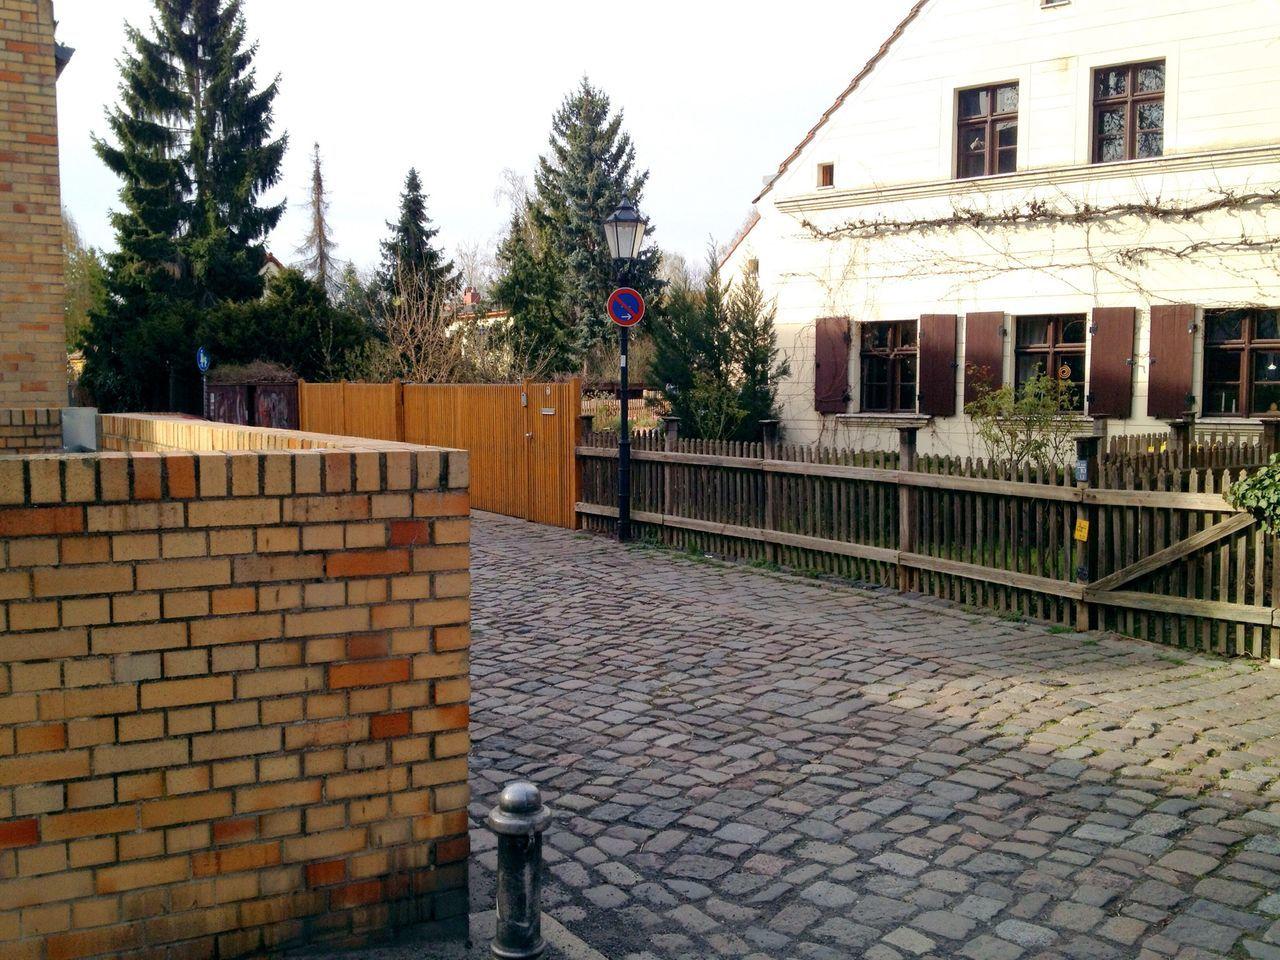 Beautiful stock photos of berliner mauer, Architecture, Building Exterior, Cobblestone, Coniferous Tree